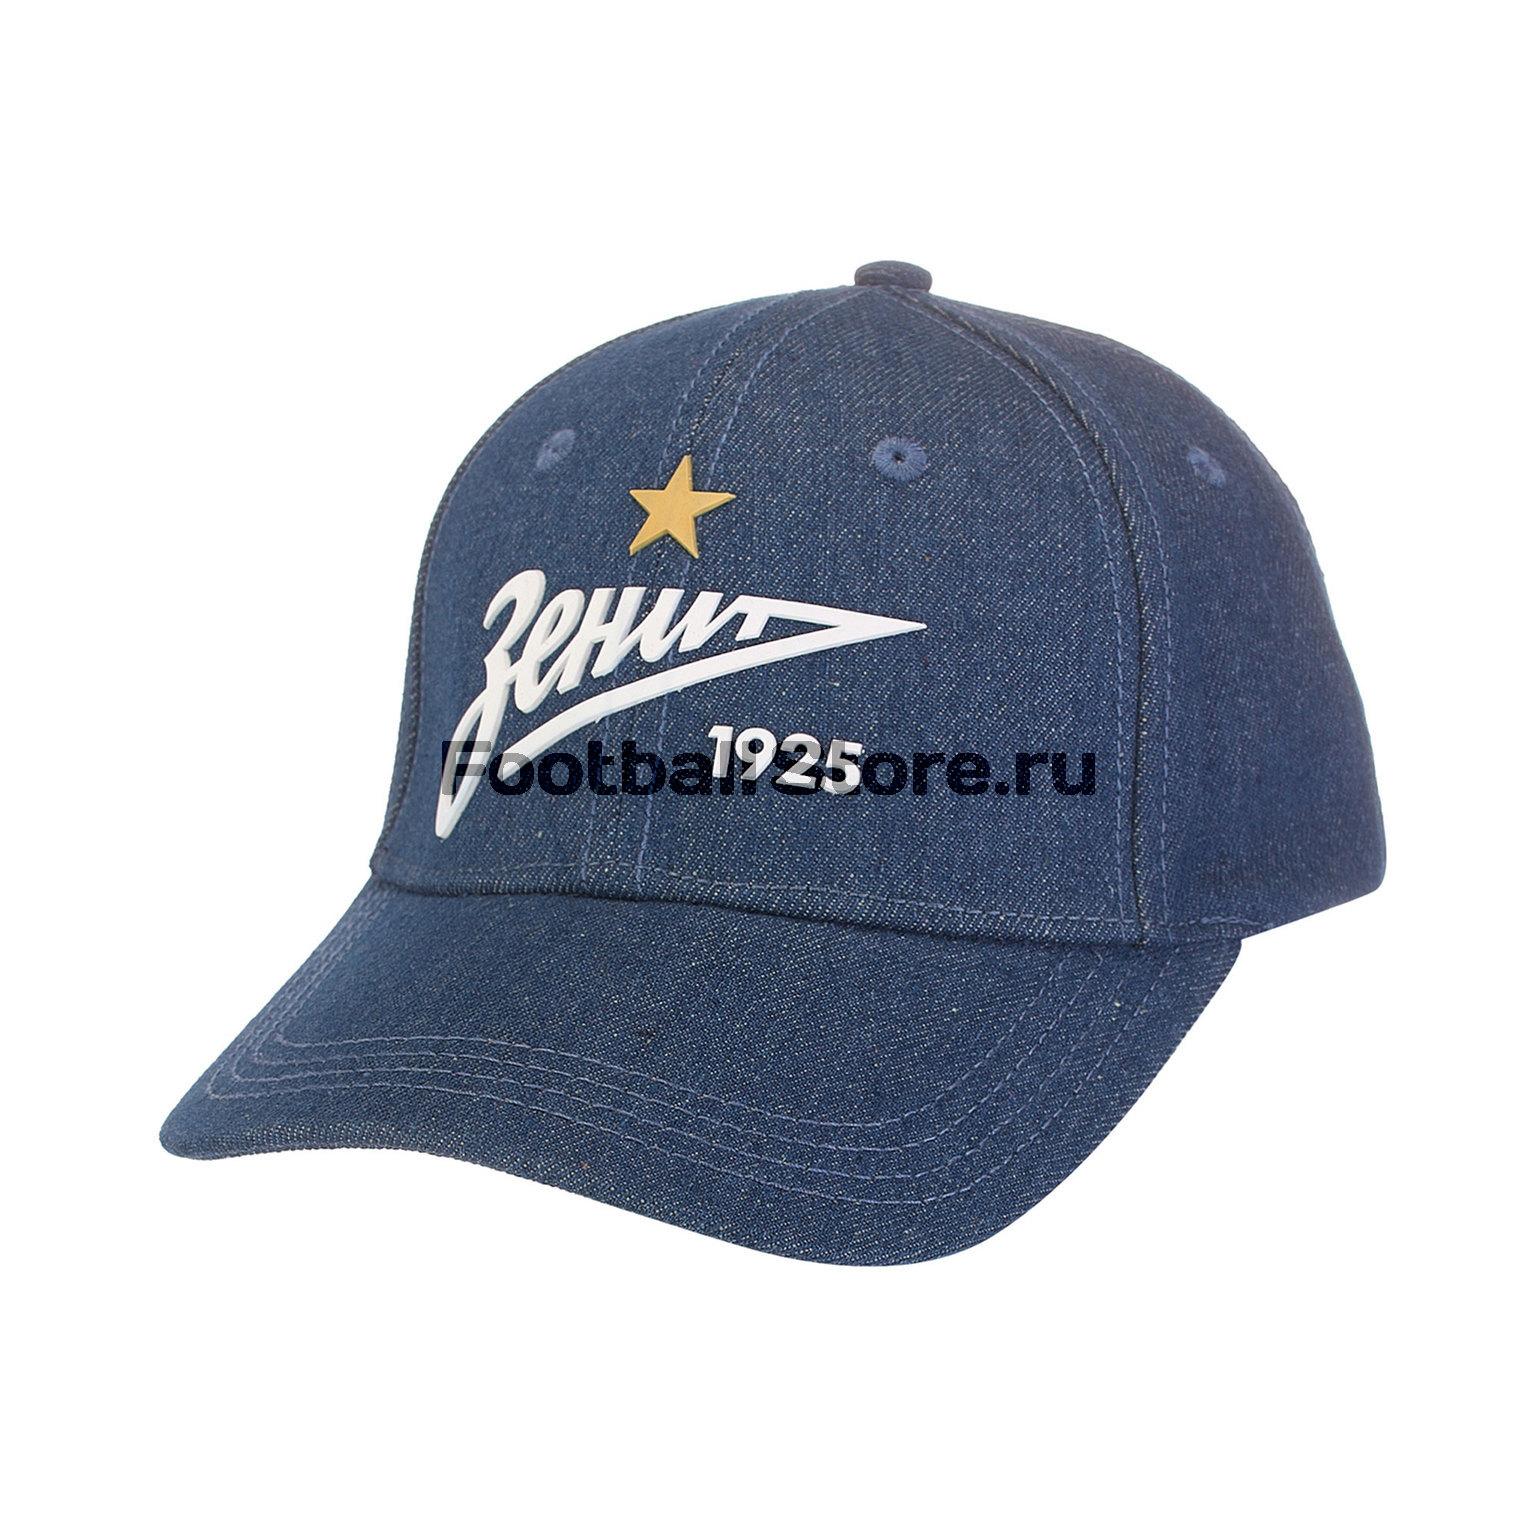 Бейсболка Zenit 19281009